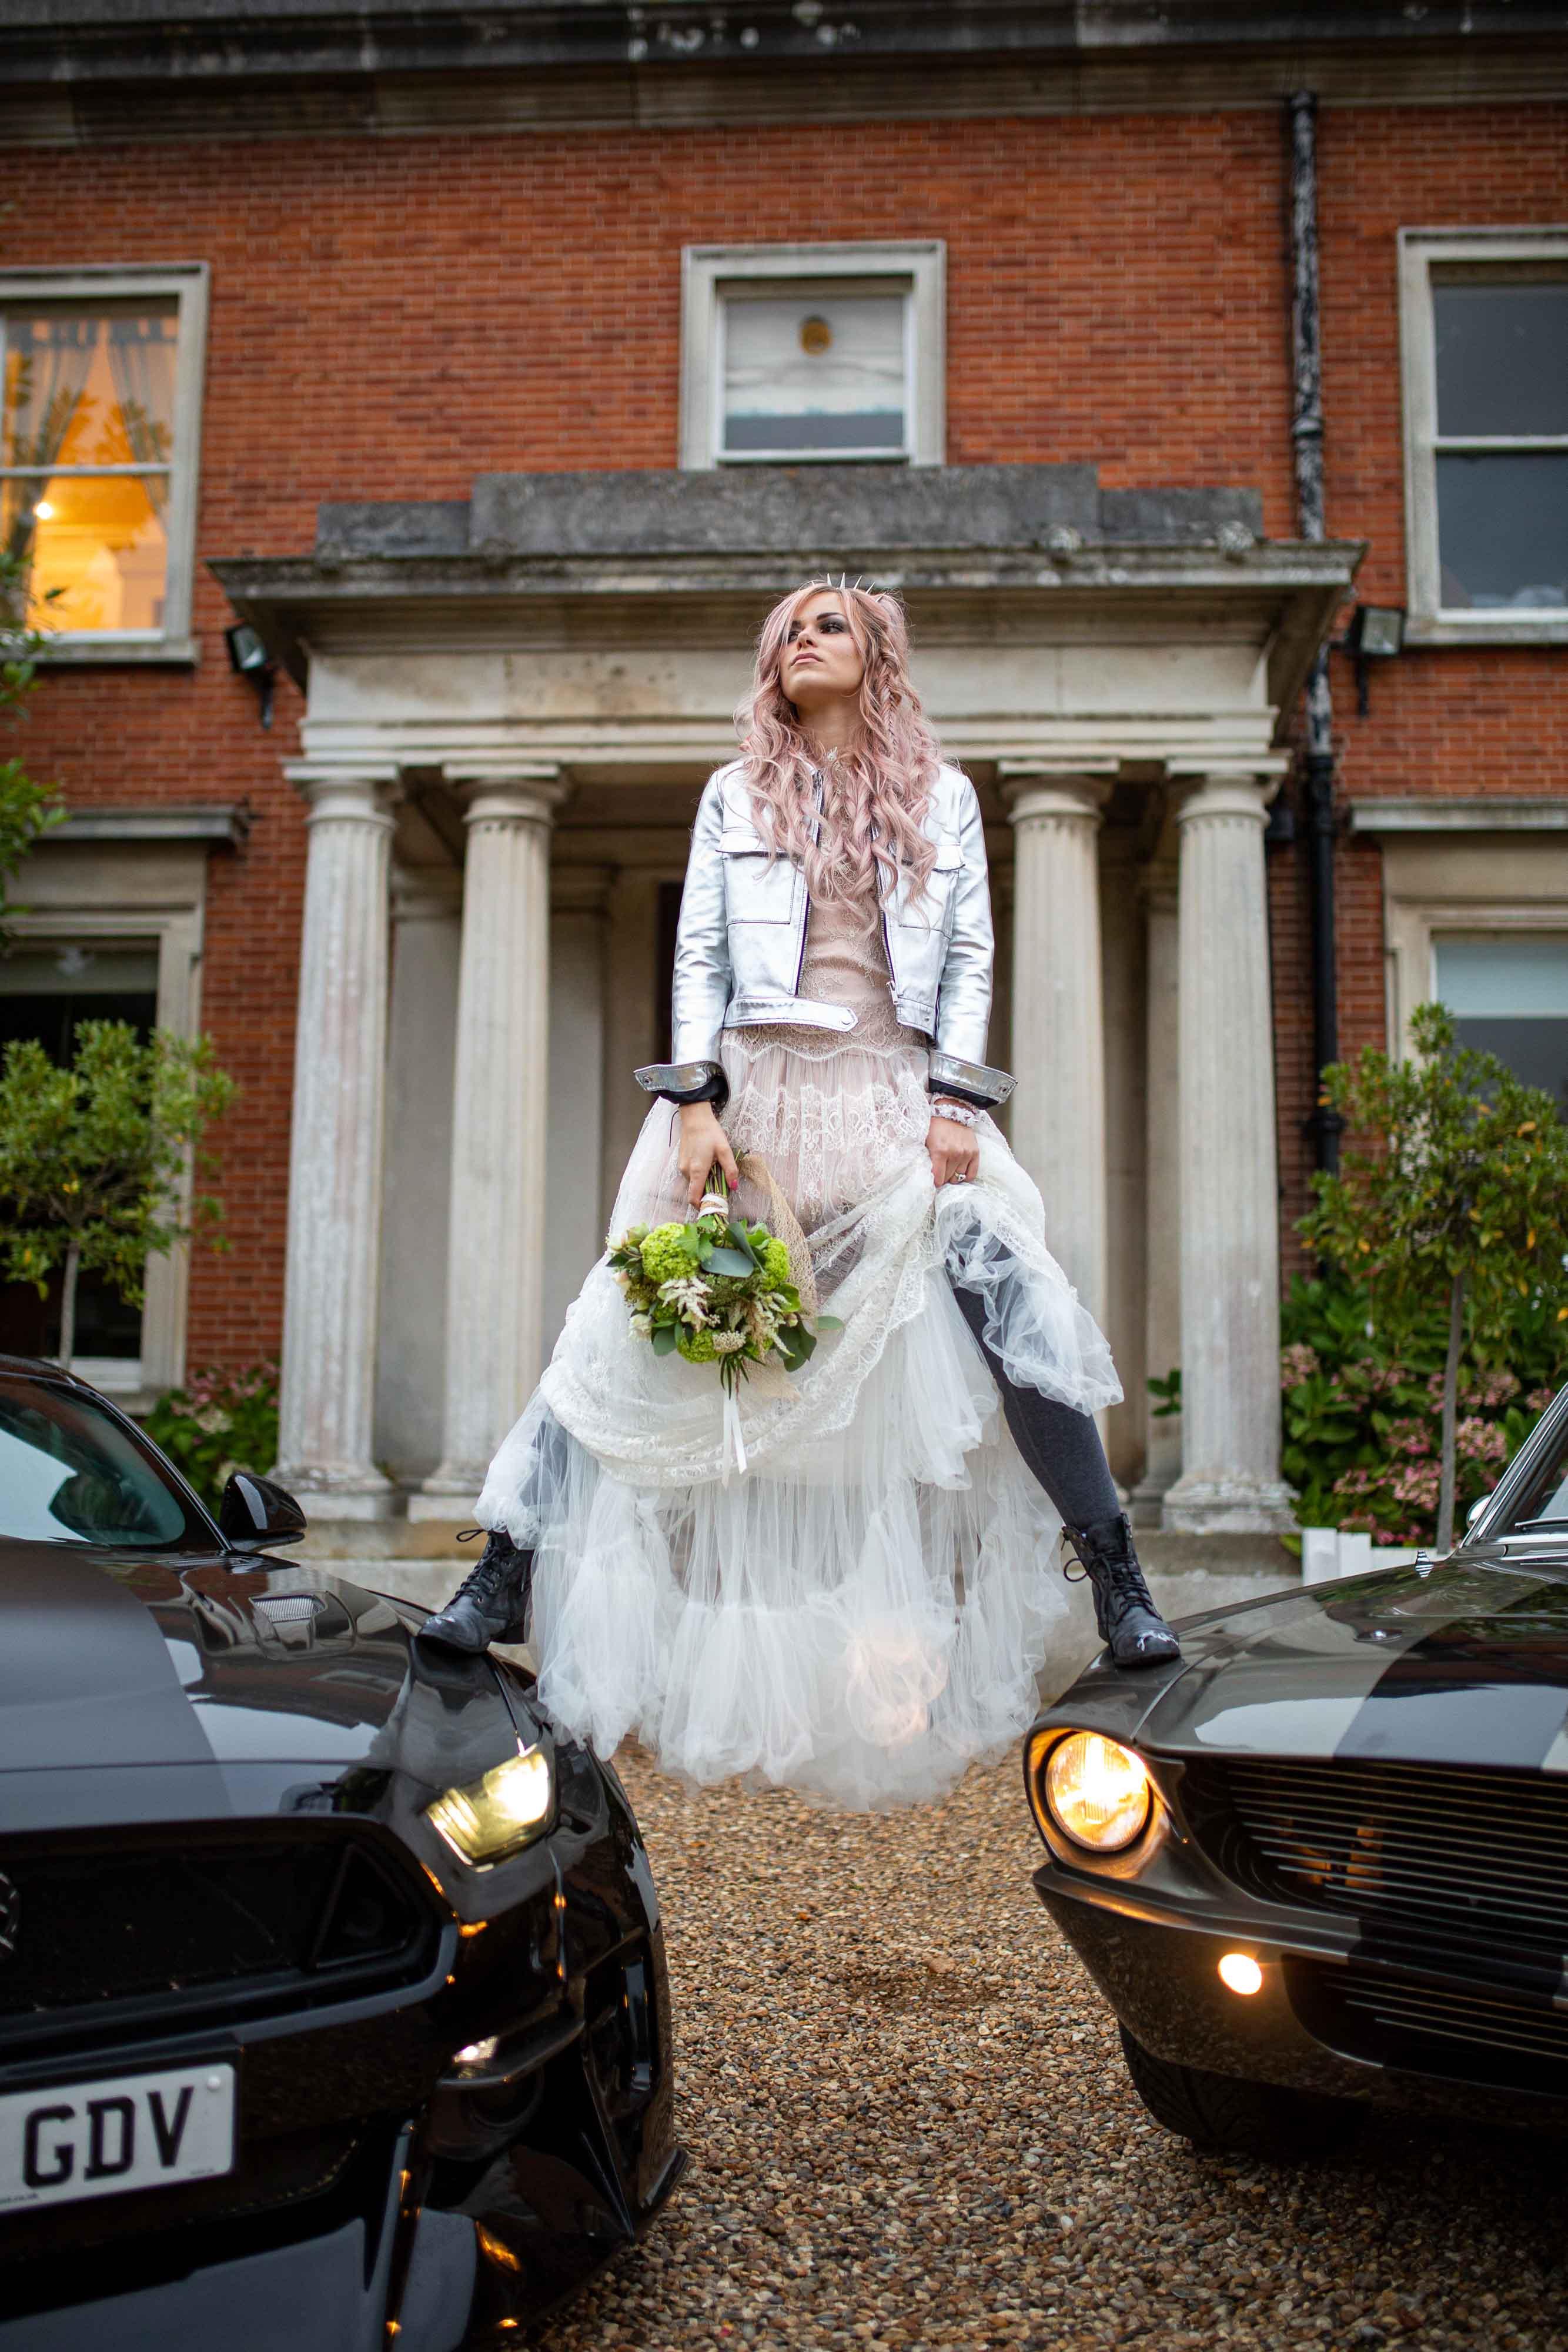 iconic wedding looks- music themed wedding- unconventional wedding- alternative wedding- badass wedding photo- courtney love style- boho wedding dress- edgy wedding look- grunge wedding